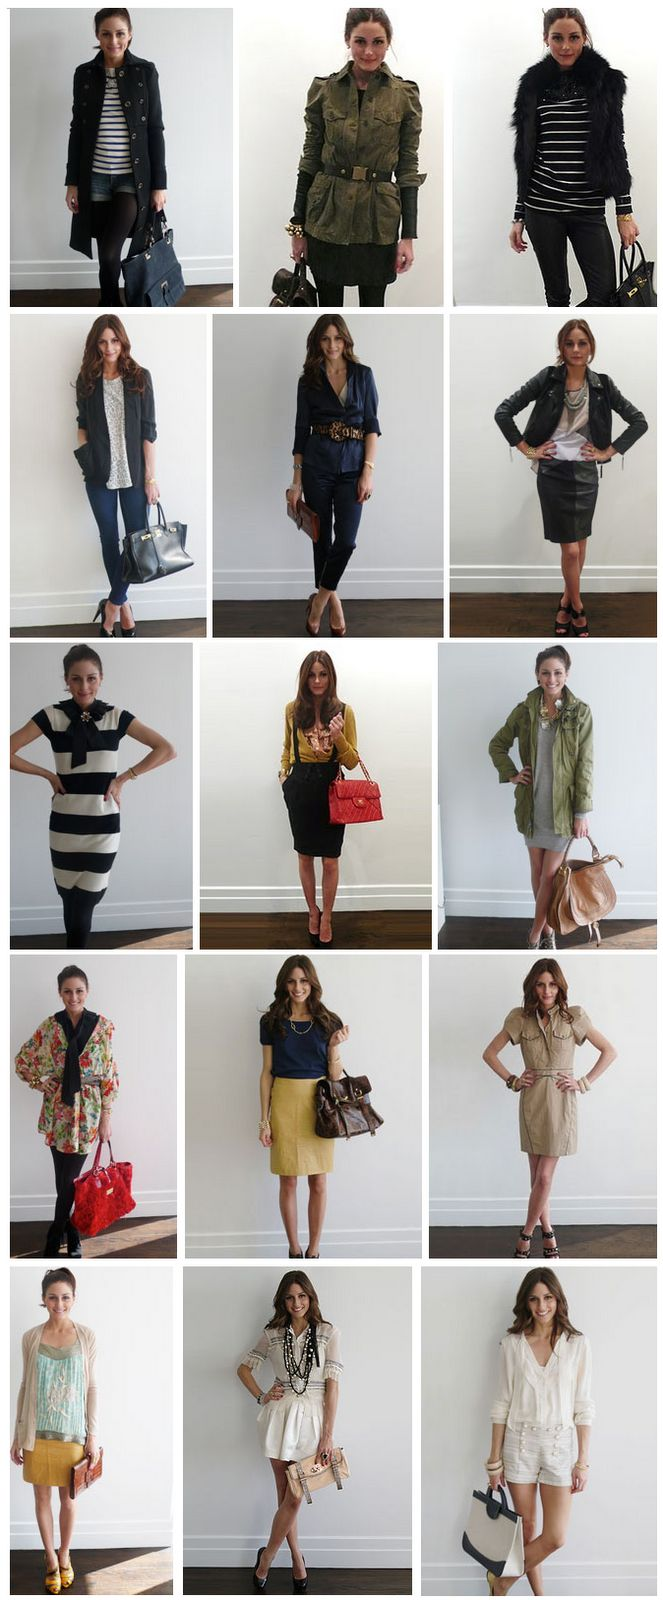 THE OLIVIA PALERMO LOOKBOOK: Olivia Palermo: Style Spotlight